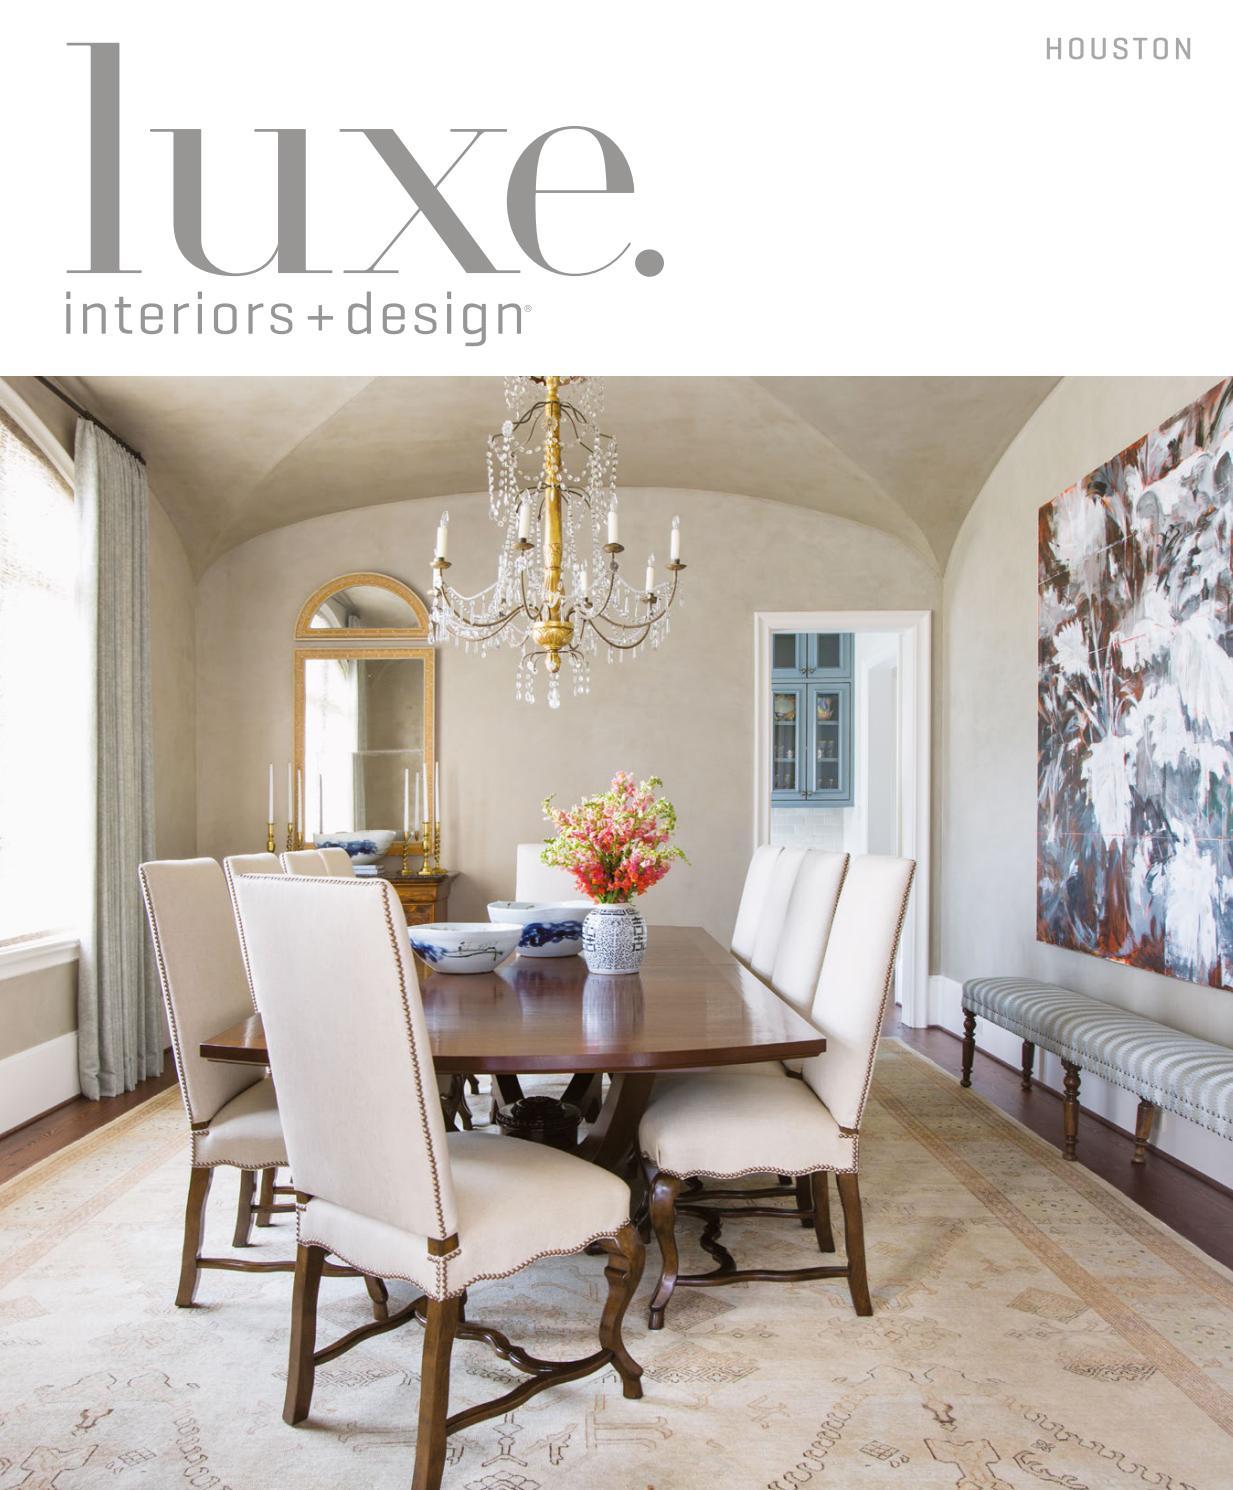 Luxe Magazine July/August 2017 Houston by SANDOW® - issuu